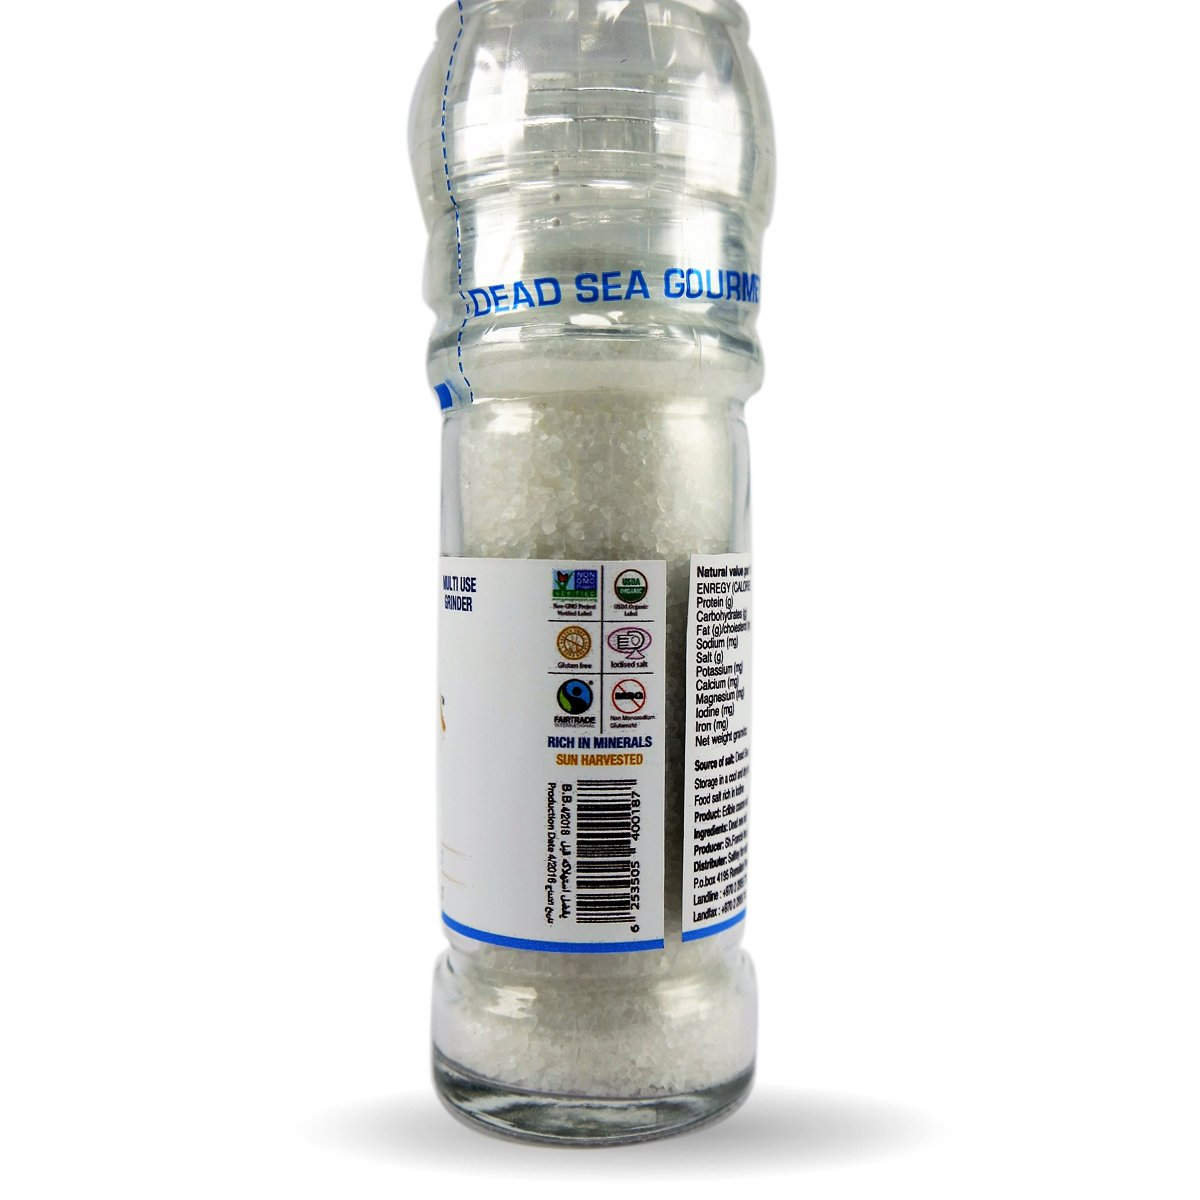 Hyksos Natural Edible Coarse Salt 3.9 oz - Multi Use Grinder by HYKSOS (Image #2)